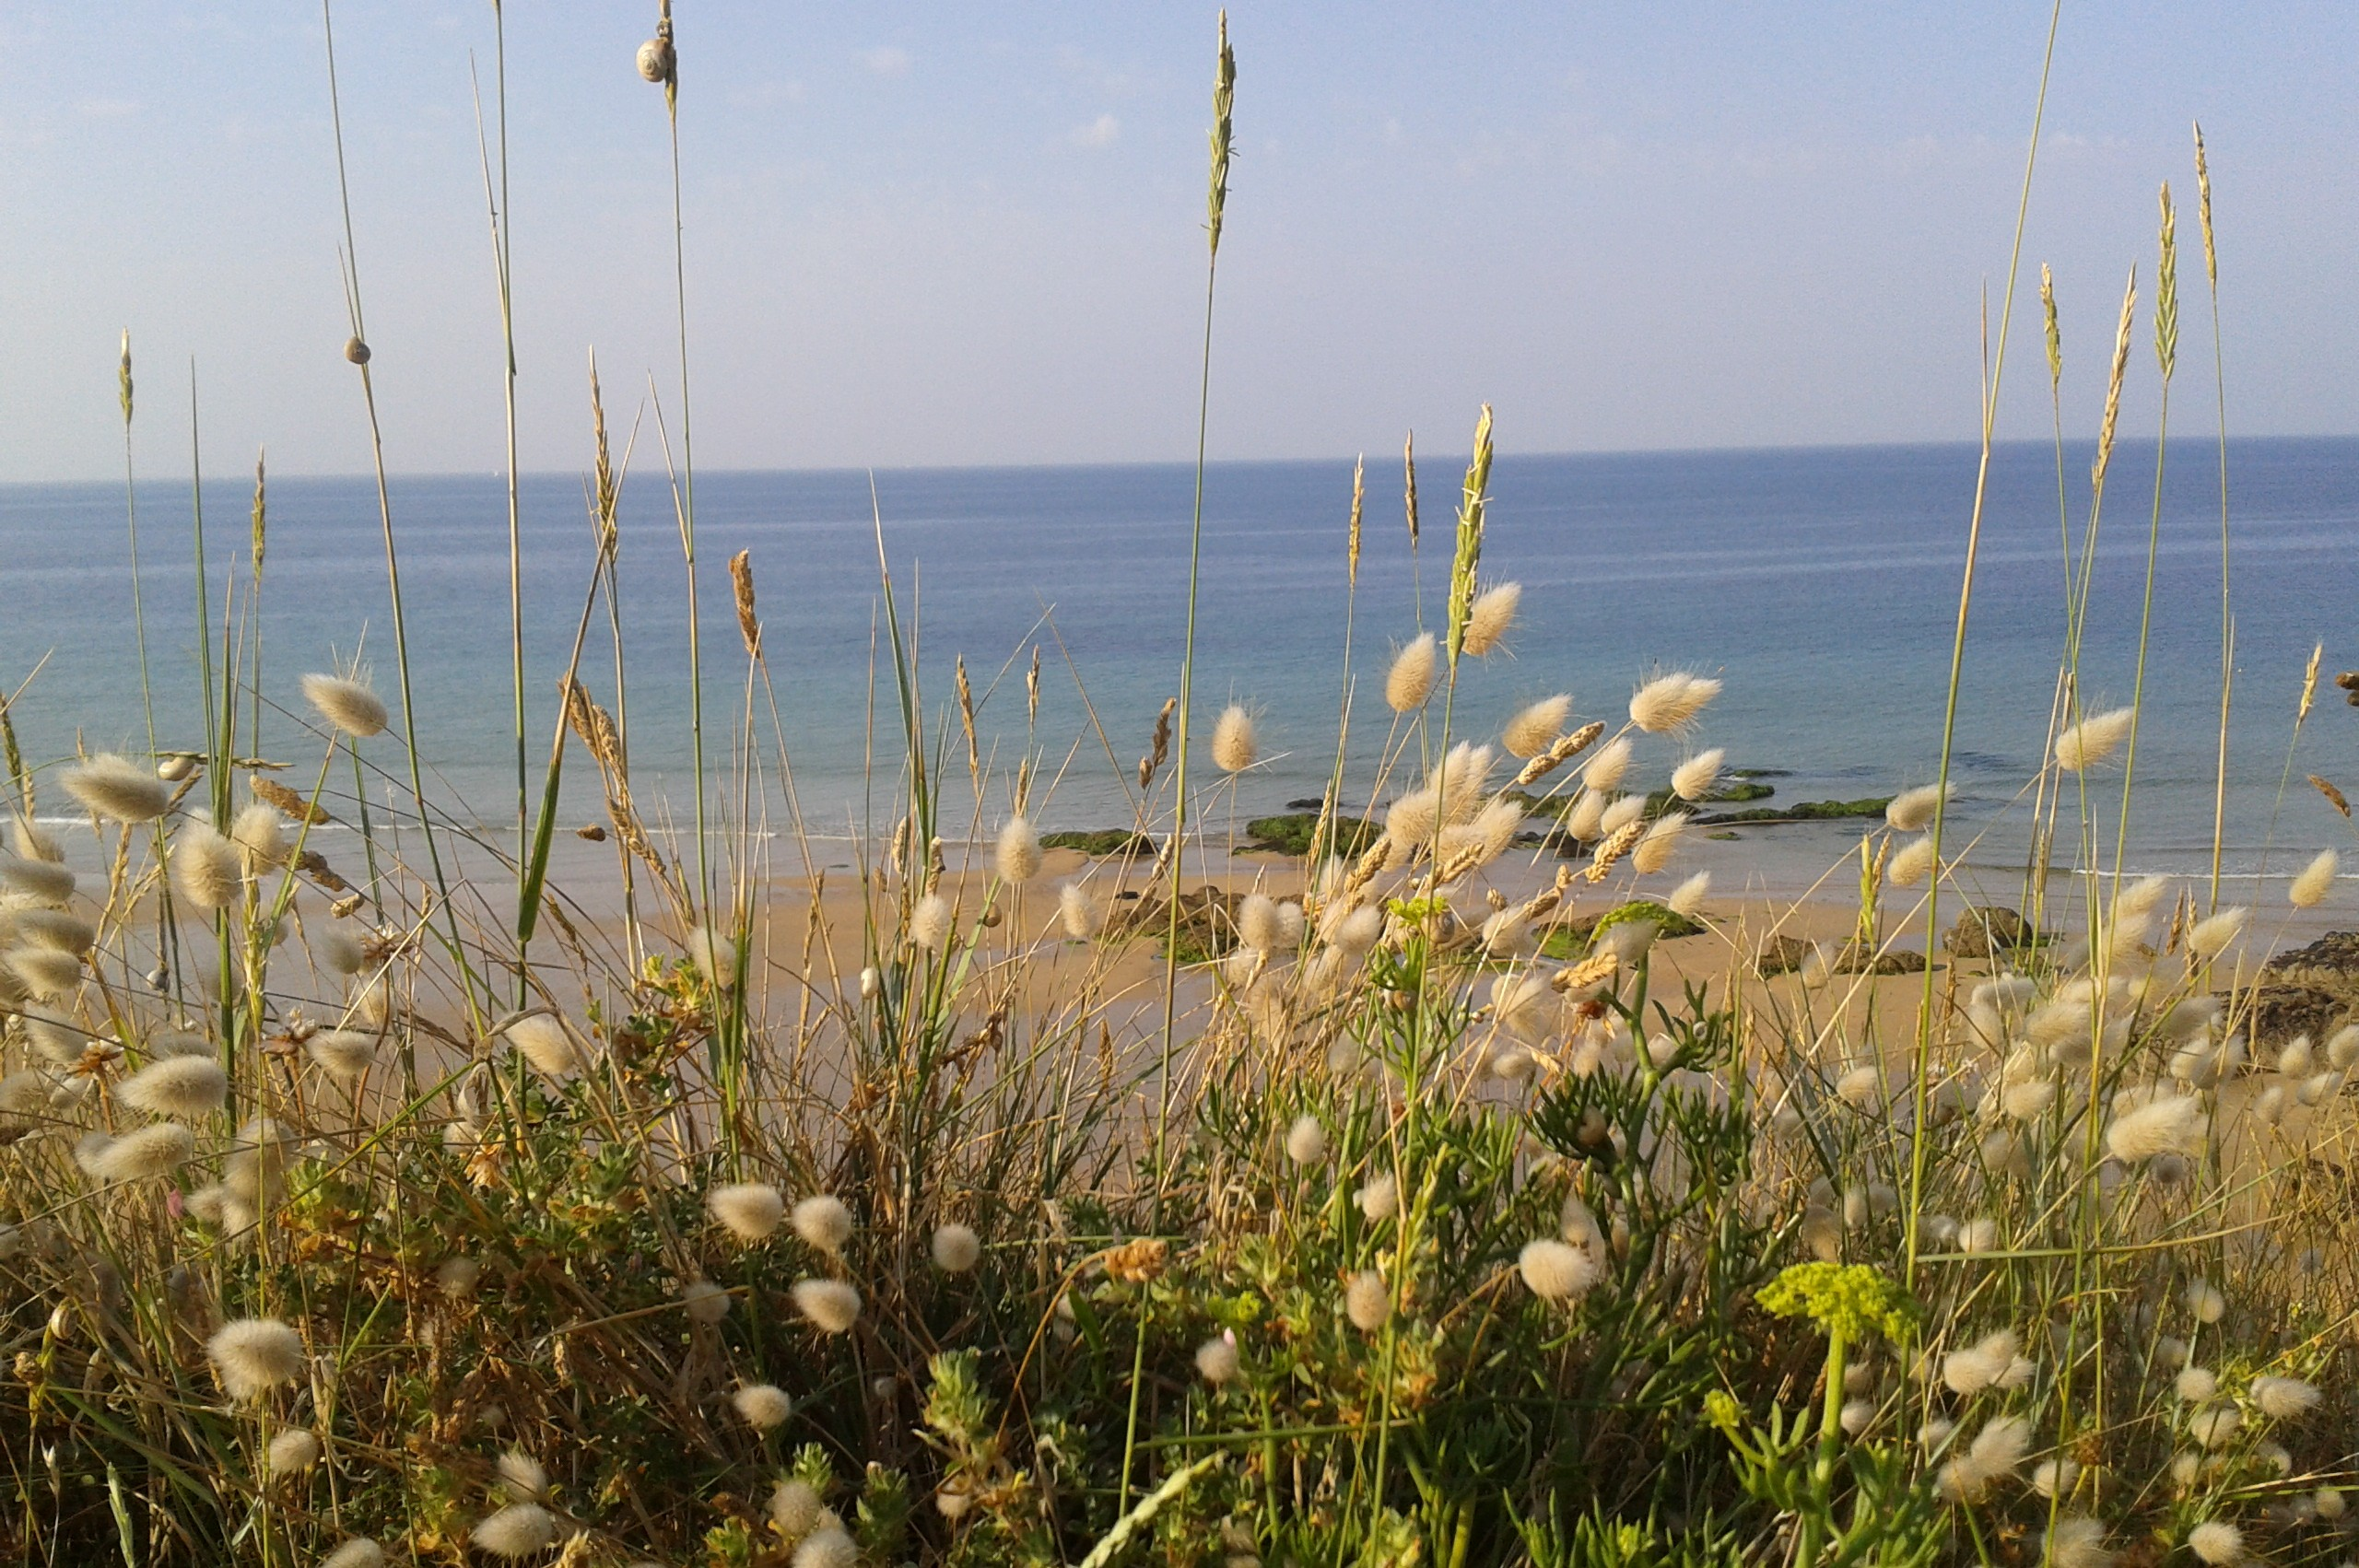 Naturôme en vacances jusqu'au 17 août